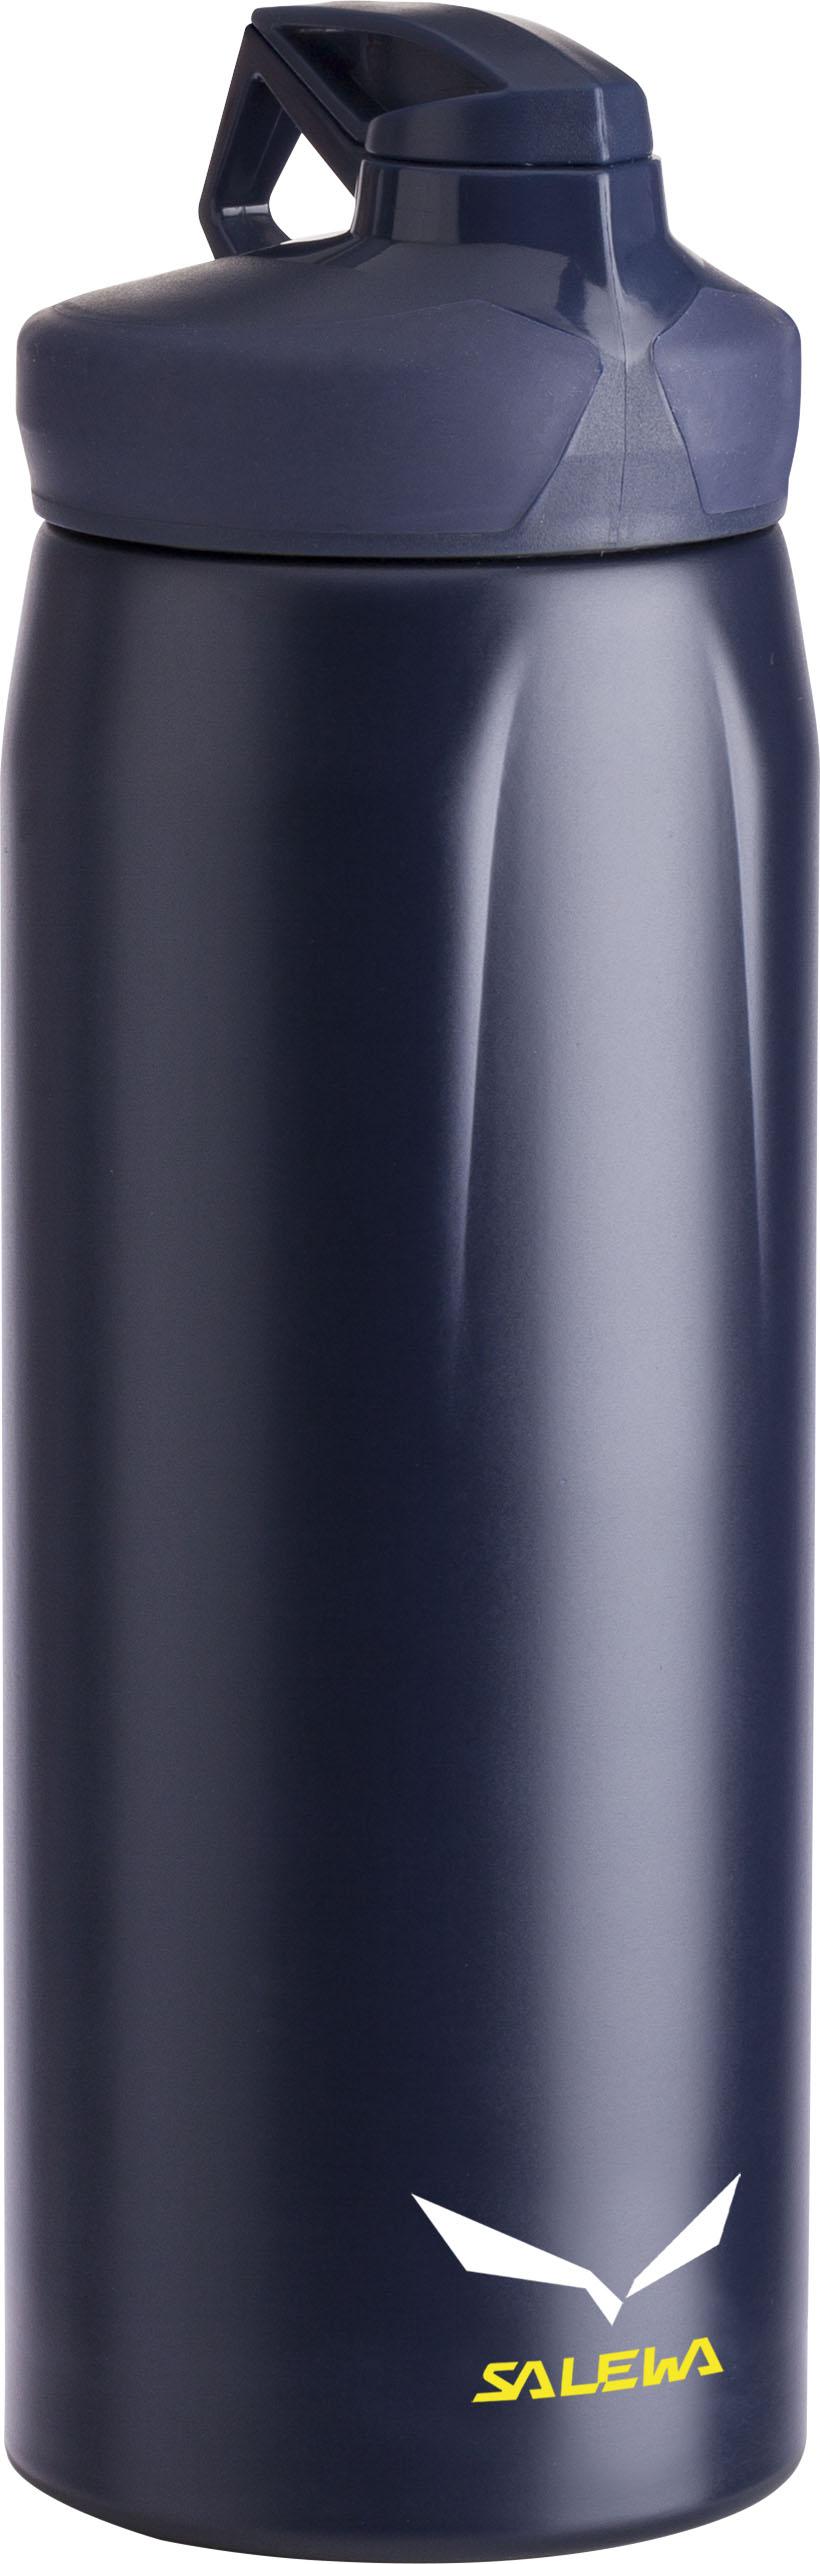 Фляга Salewa Bottles HIKER BOTTLE 1,0 L NAVY / - артикул: 715690170